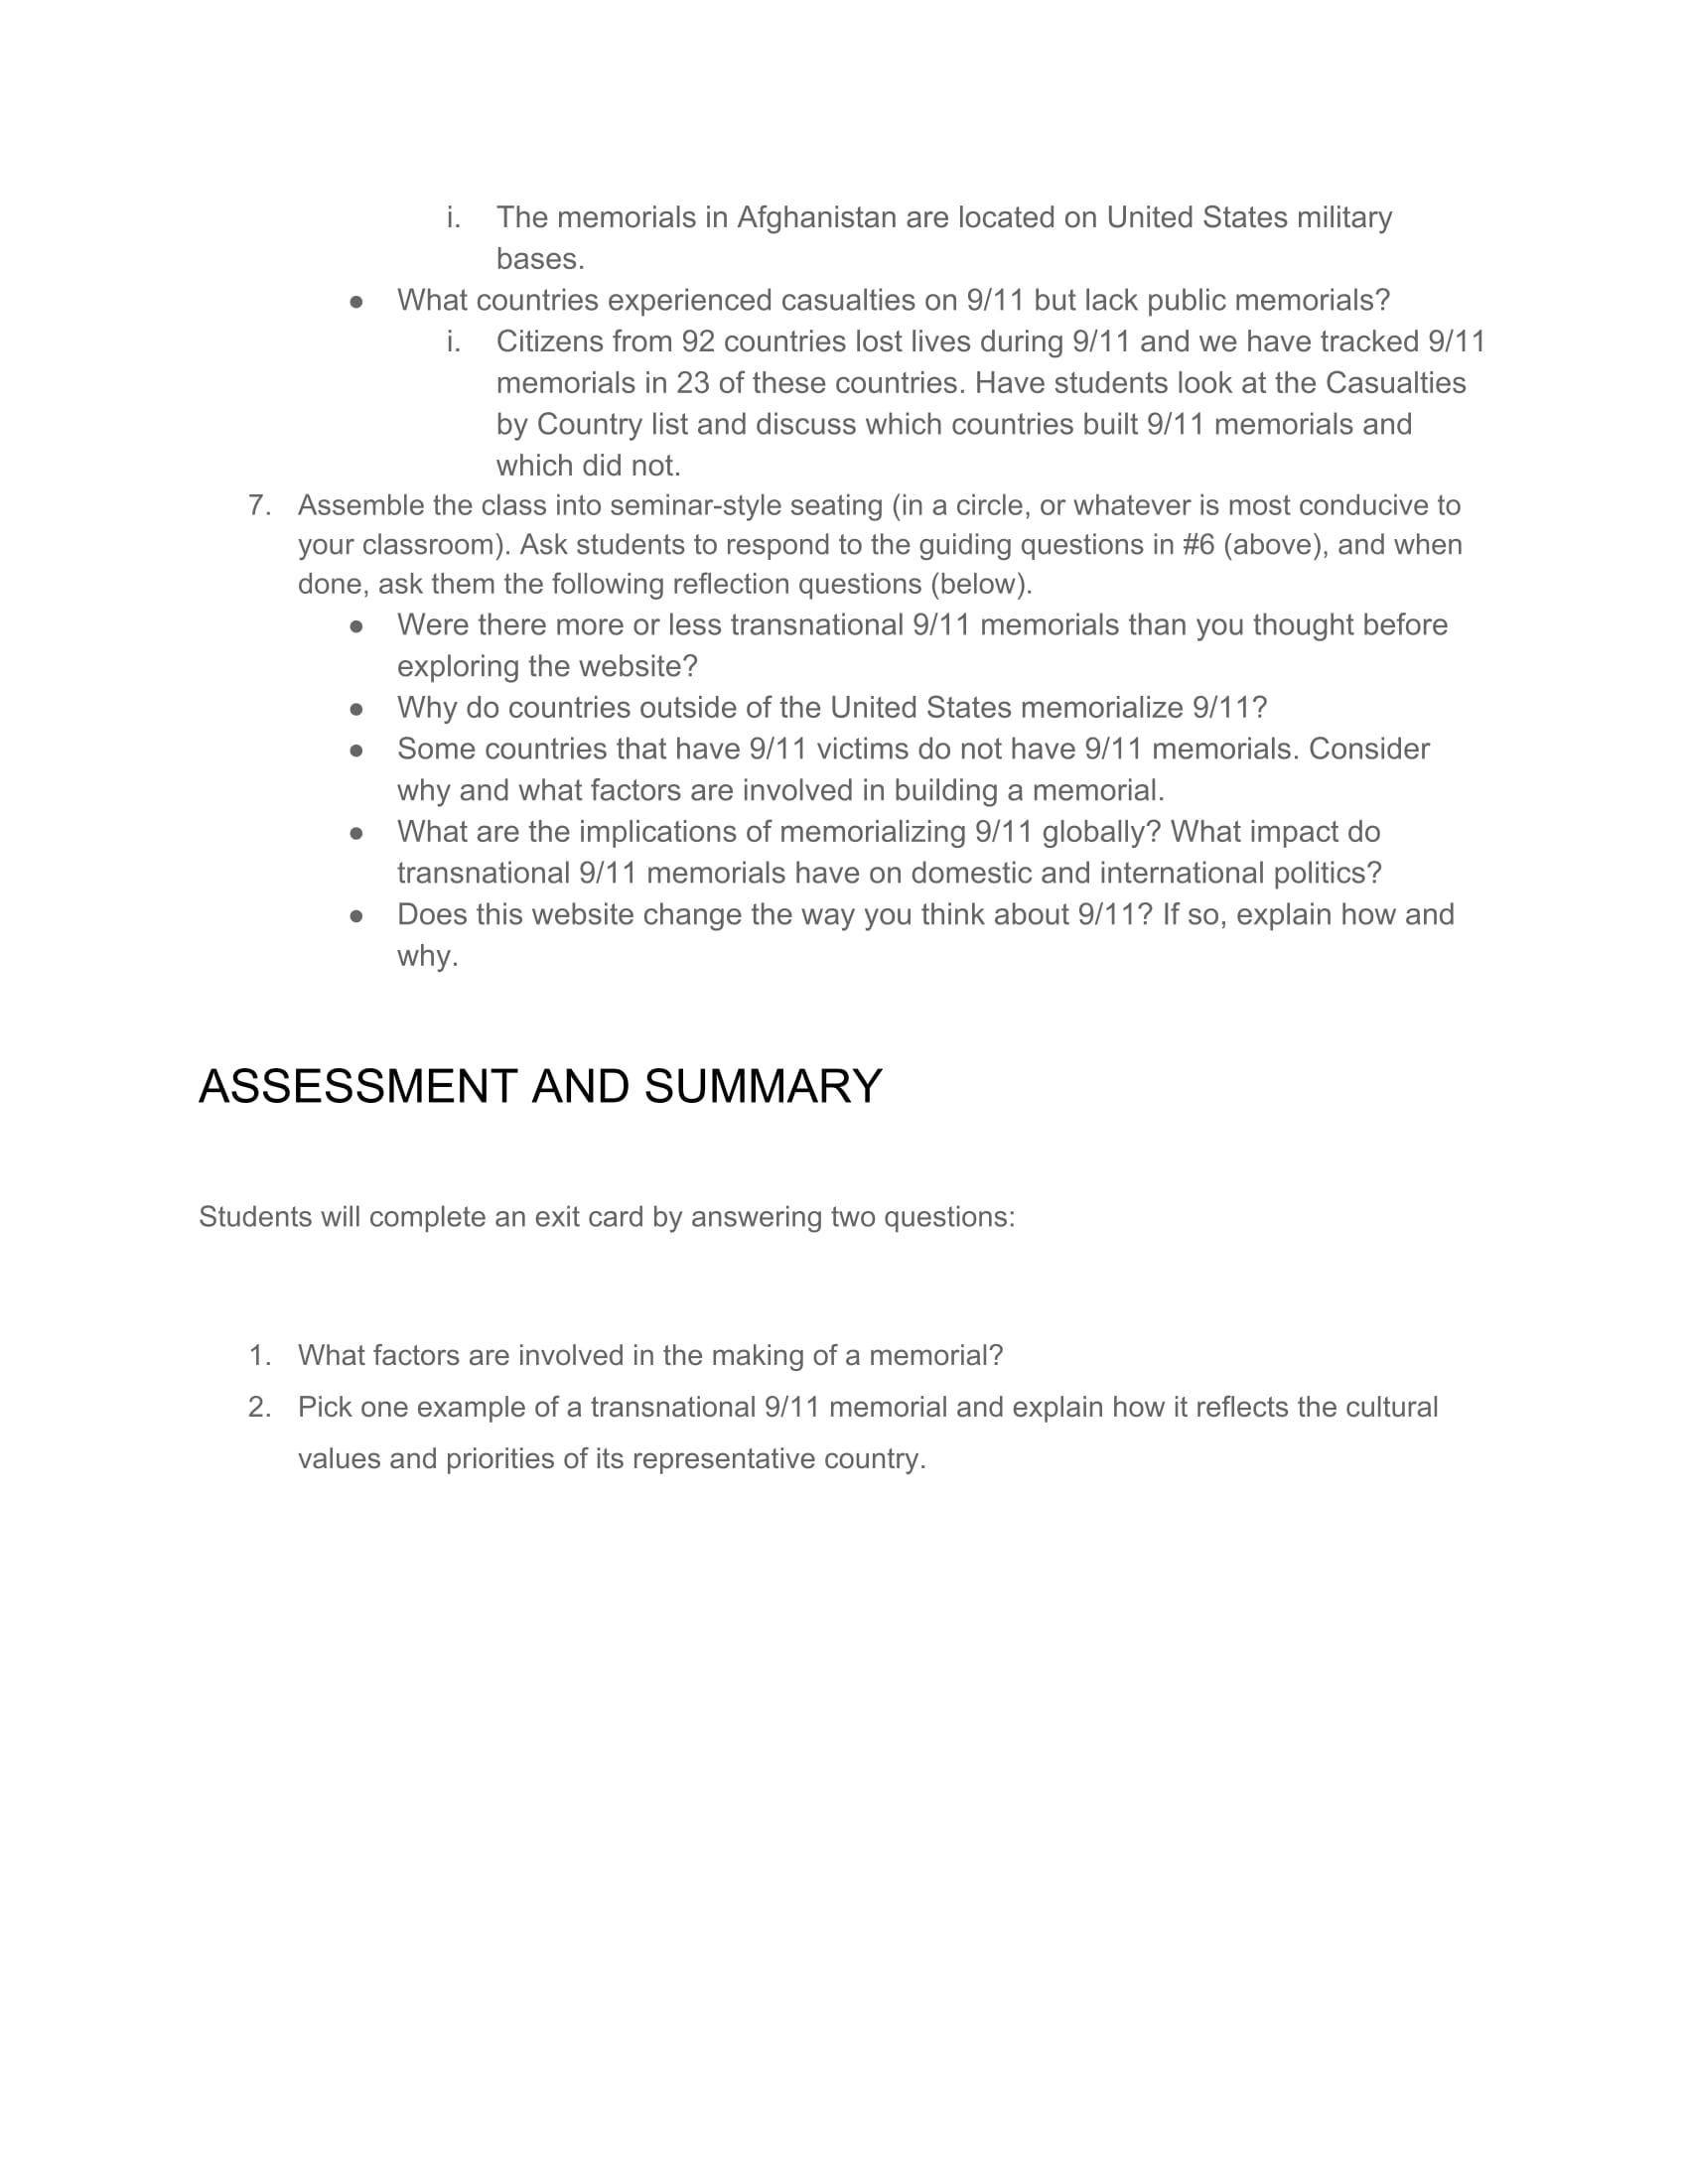 Social Studies Lesson Plan Final-5.jpg